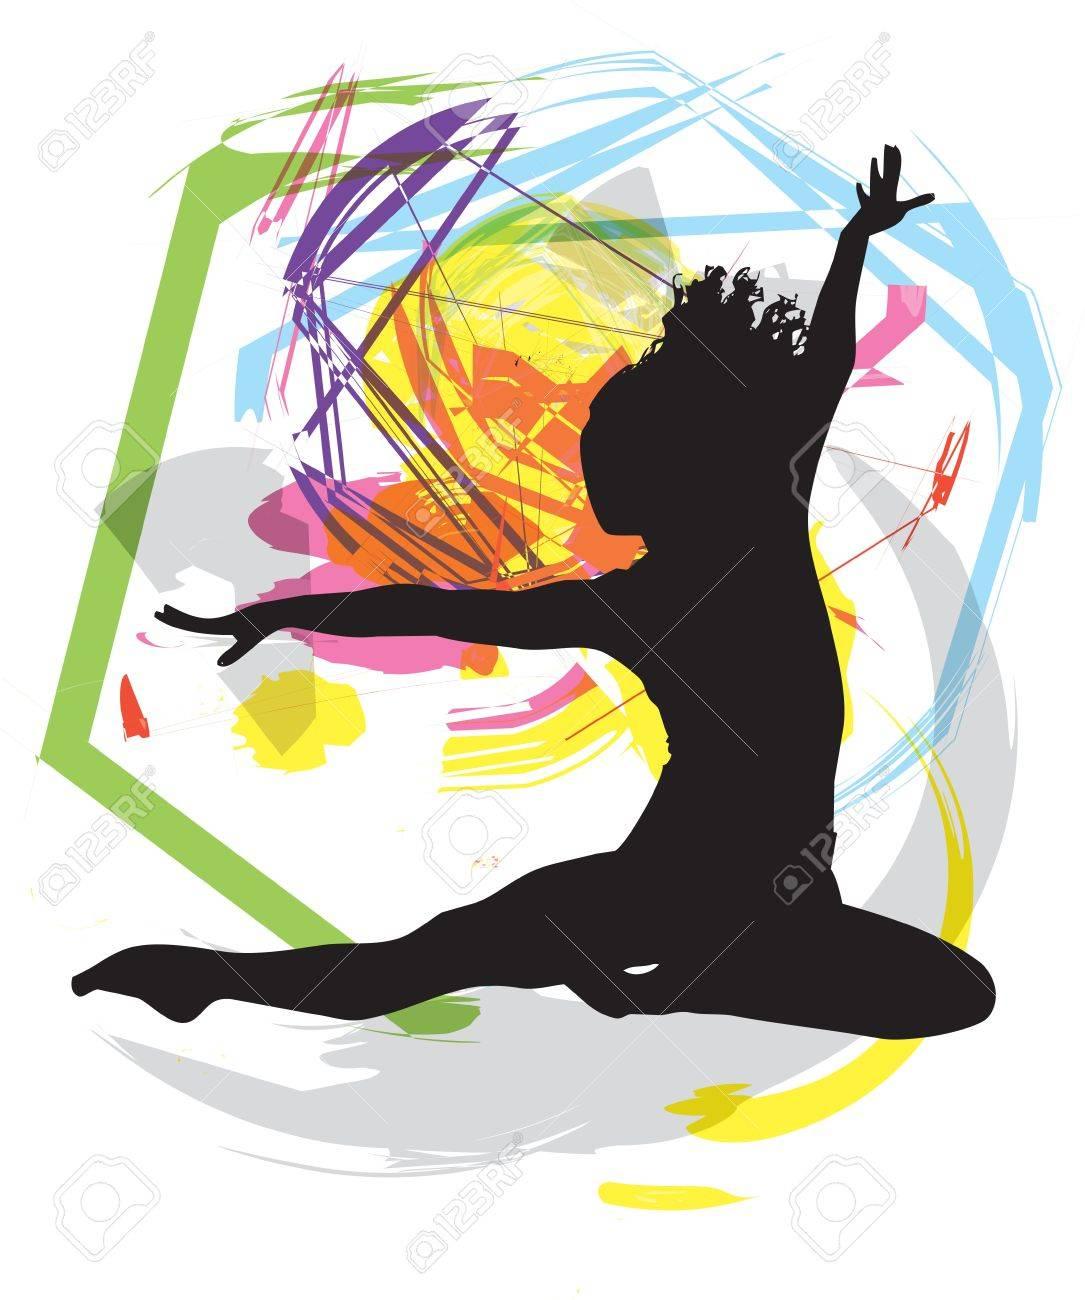 Dancing illustration Stock Vector - 10969395